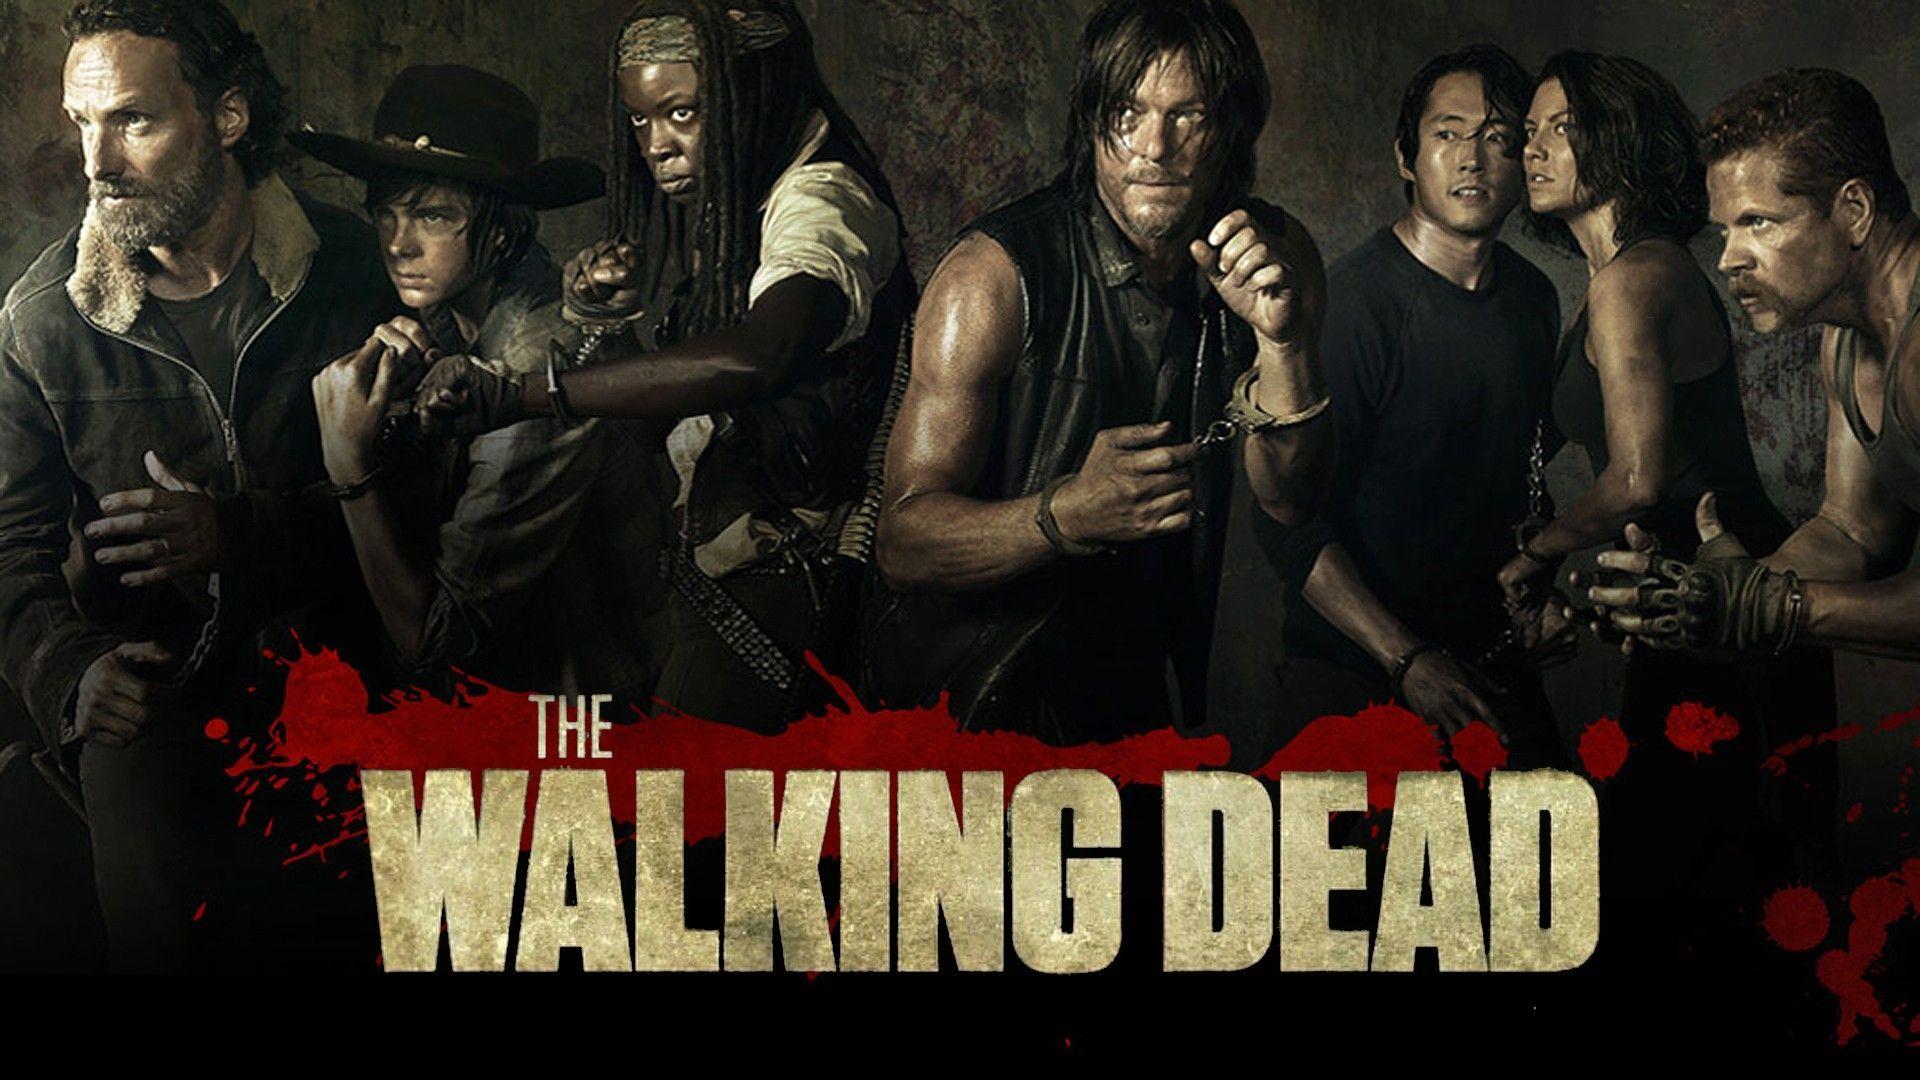 1289 - ¿Cuánto sabes de the Walking Dead?